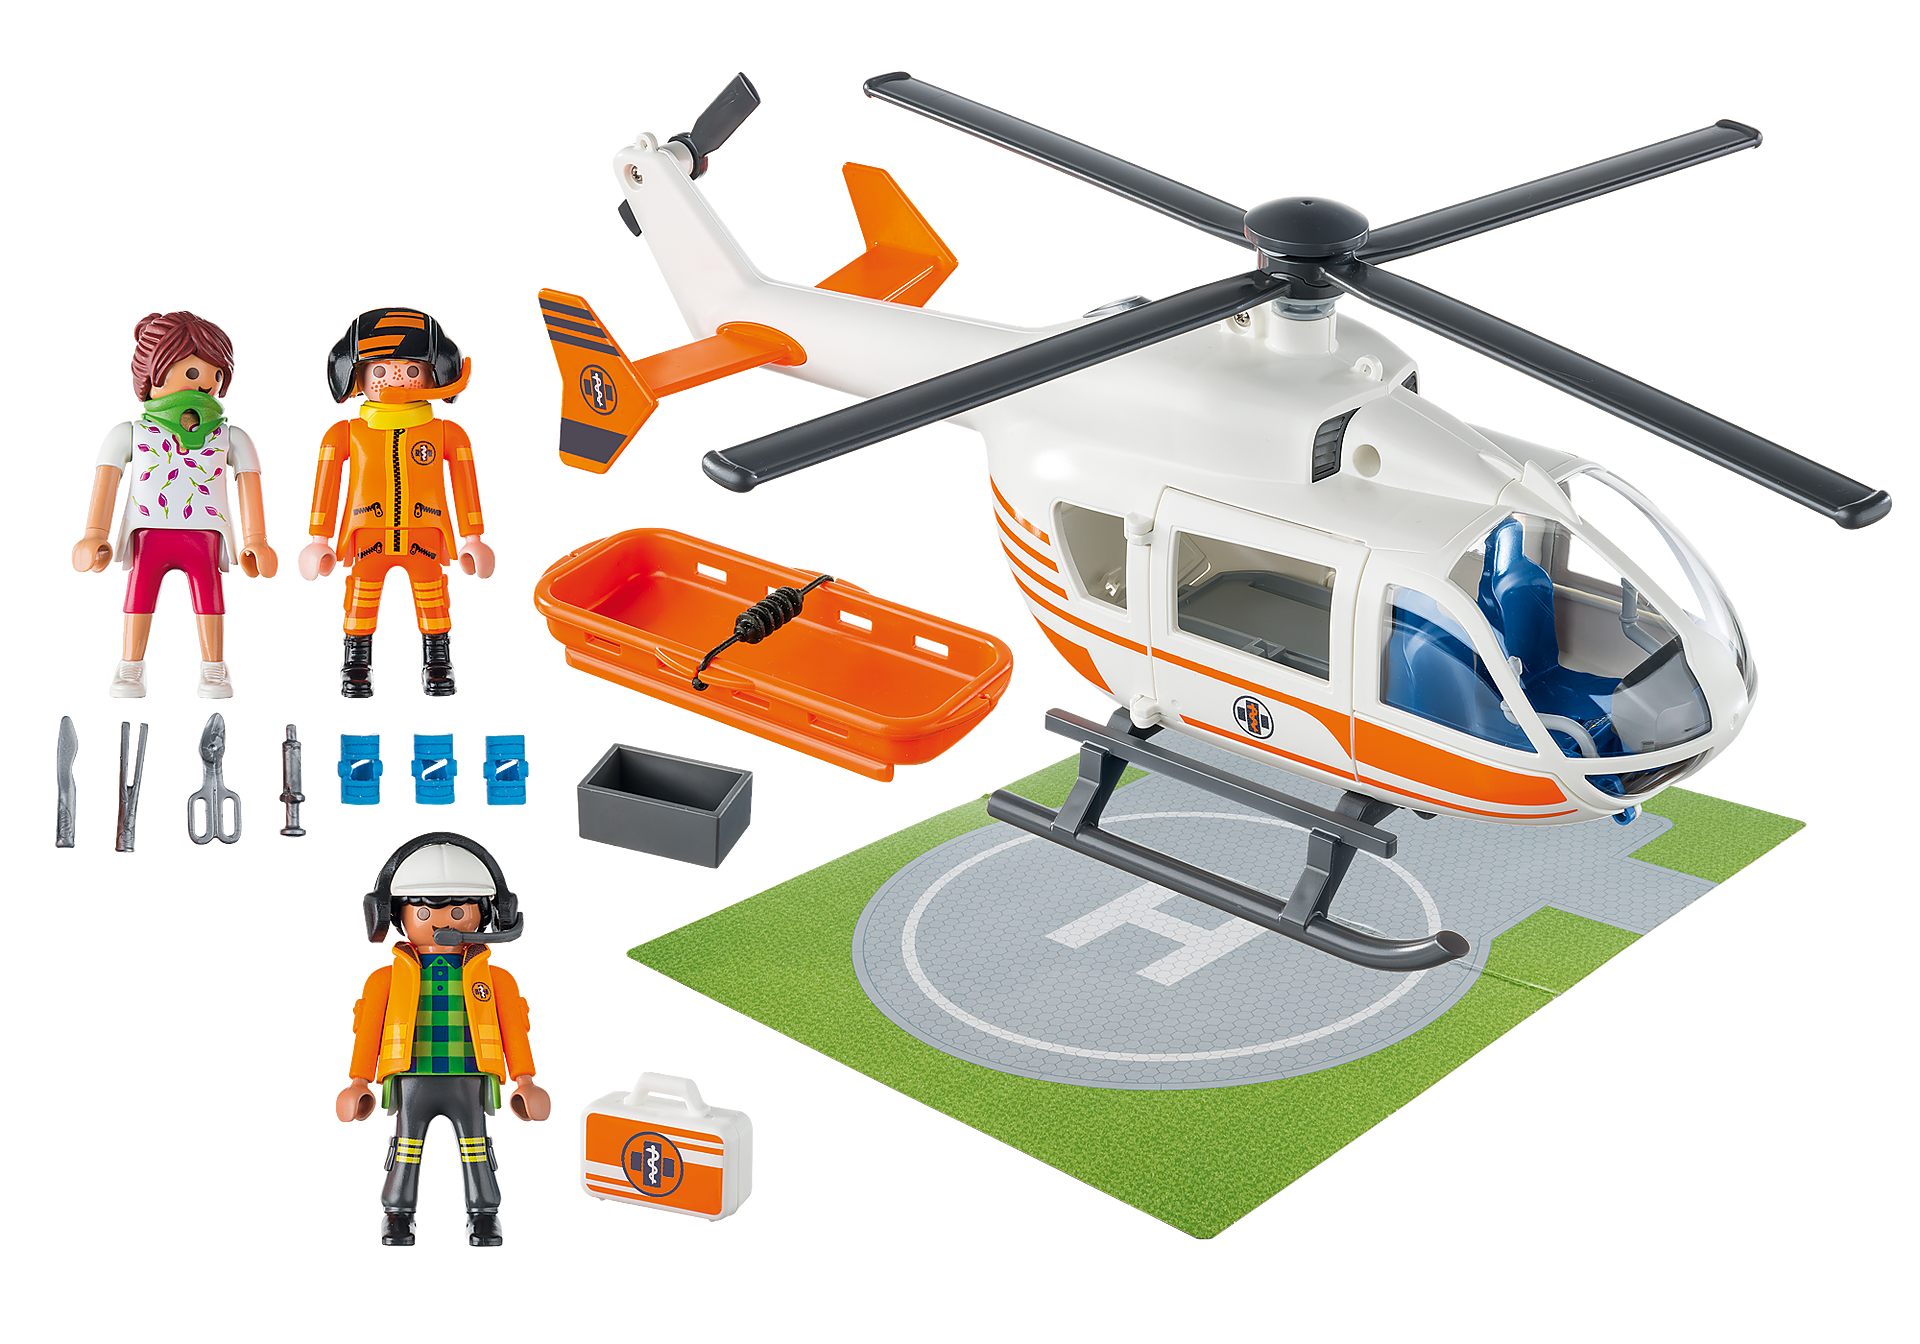 70048 Rettungshelikopter zoom image3